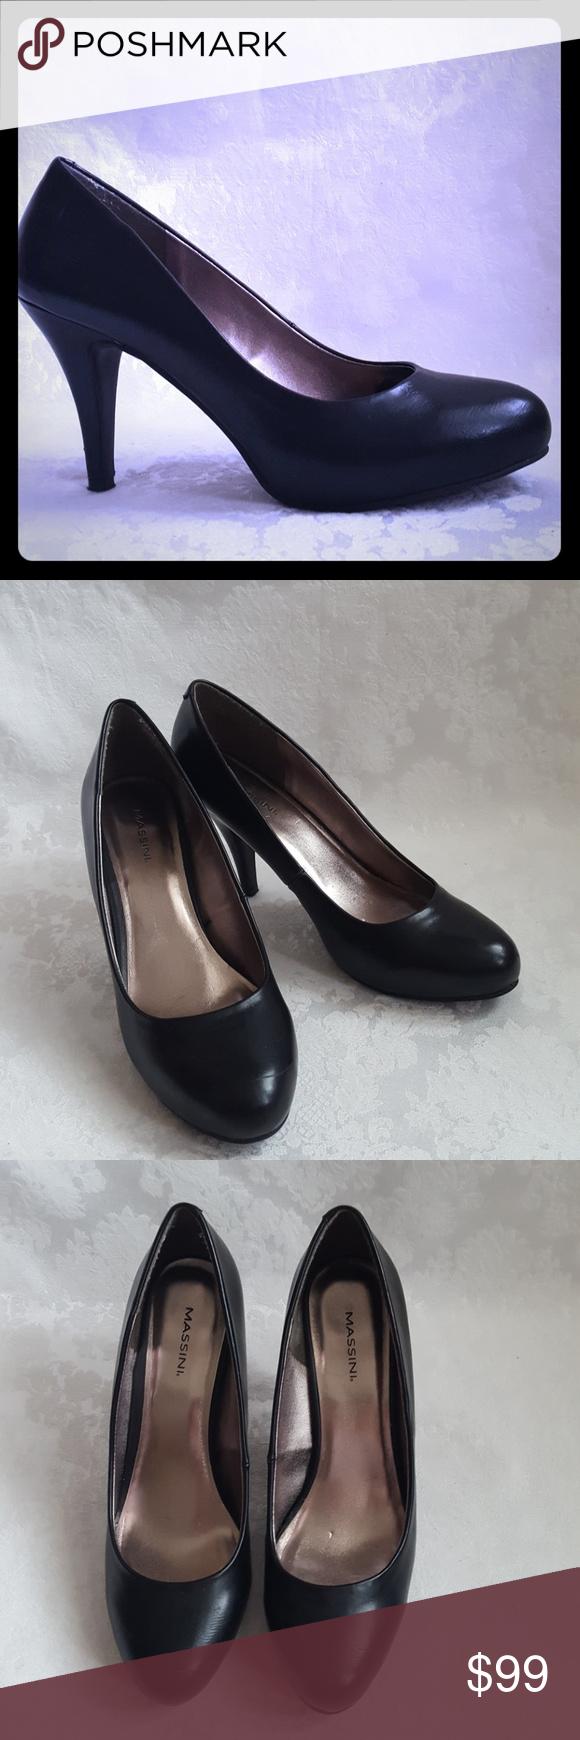 971574fcad4b Massini Black Platform High Heels